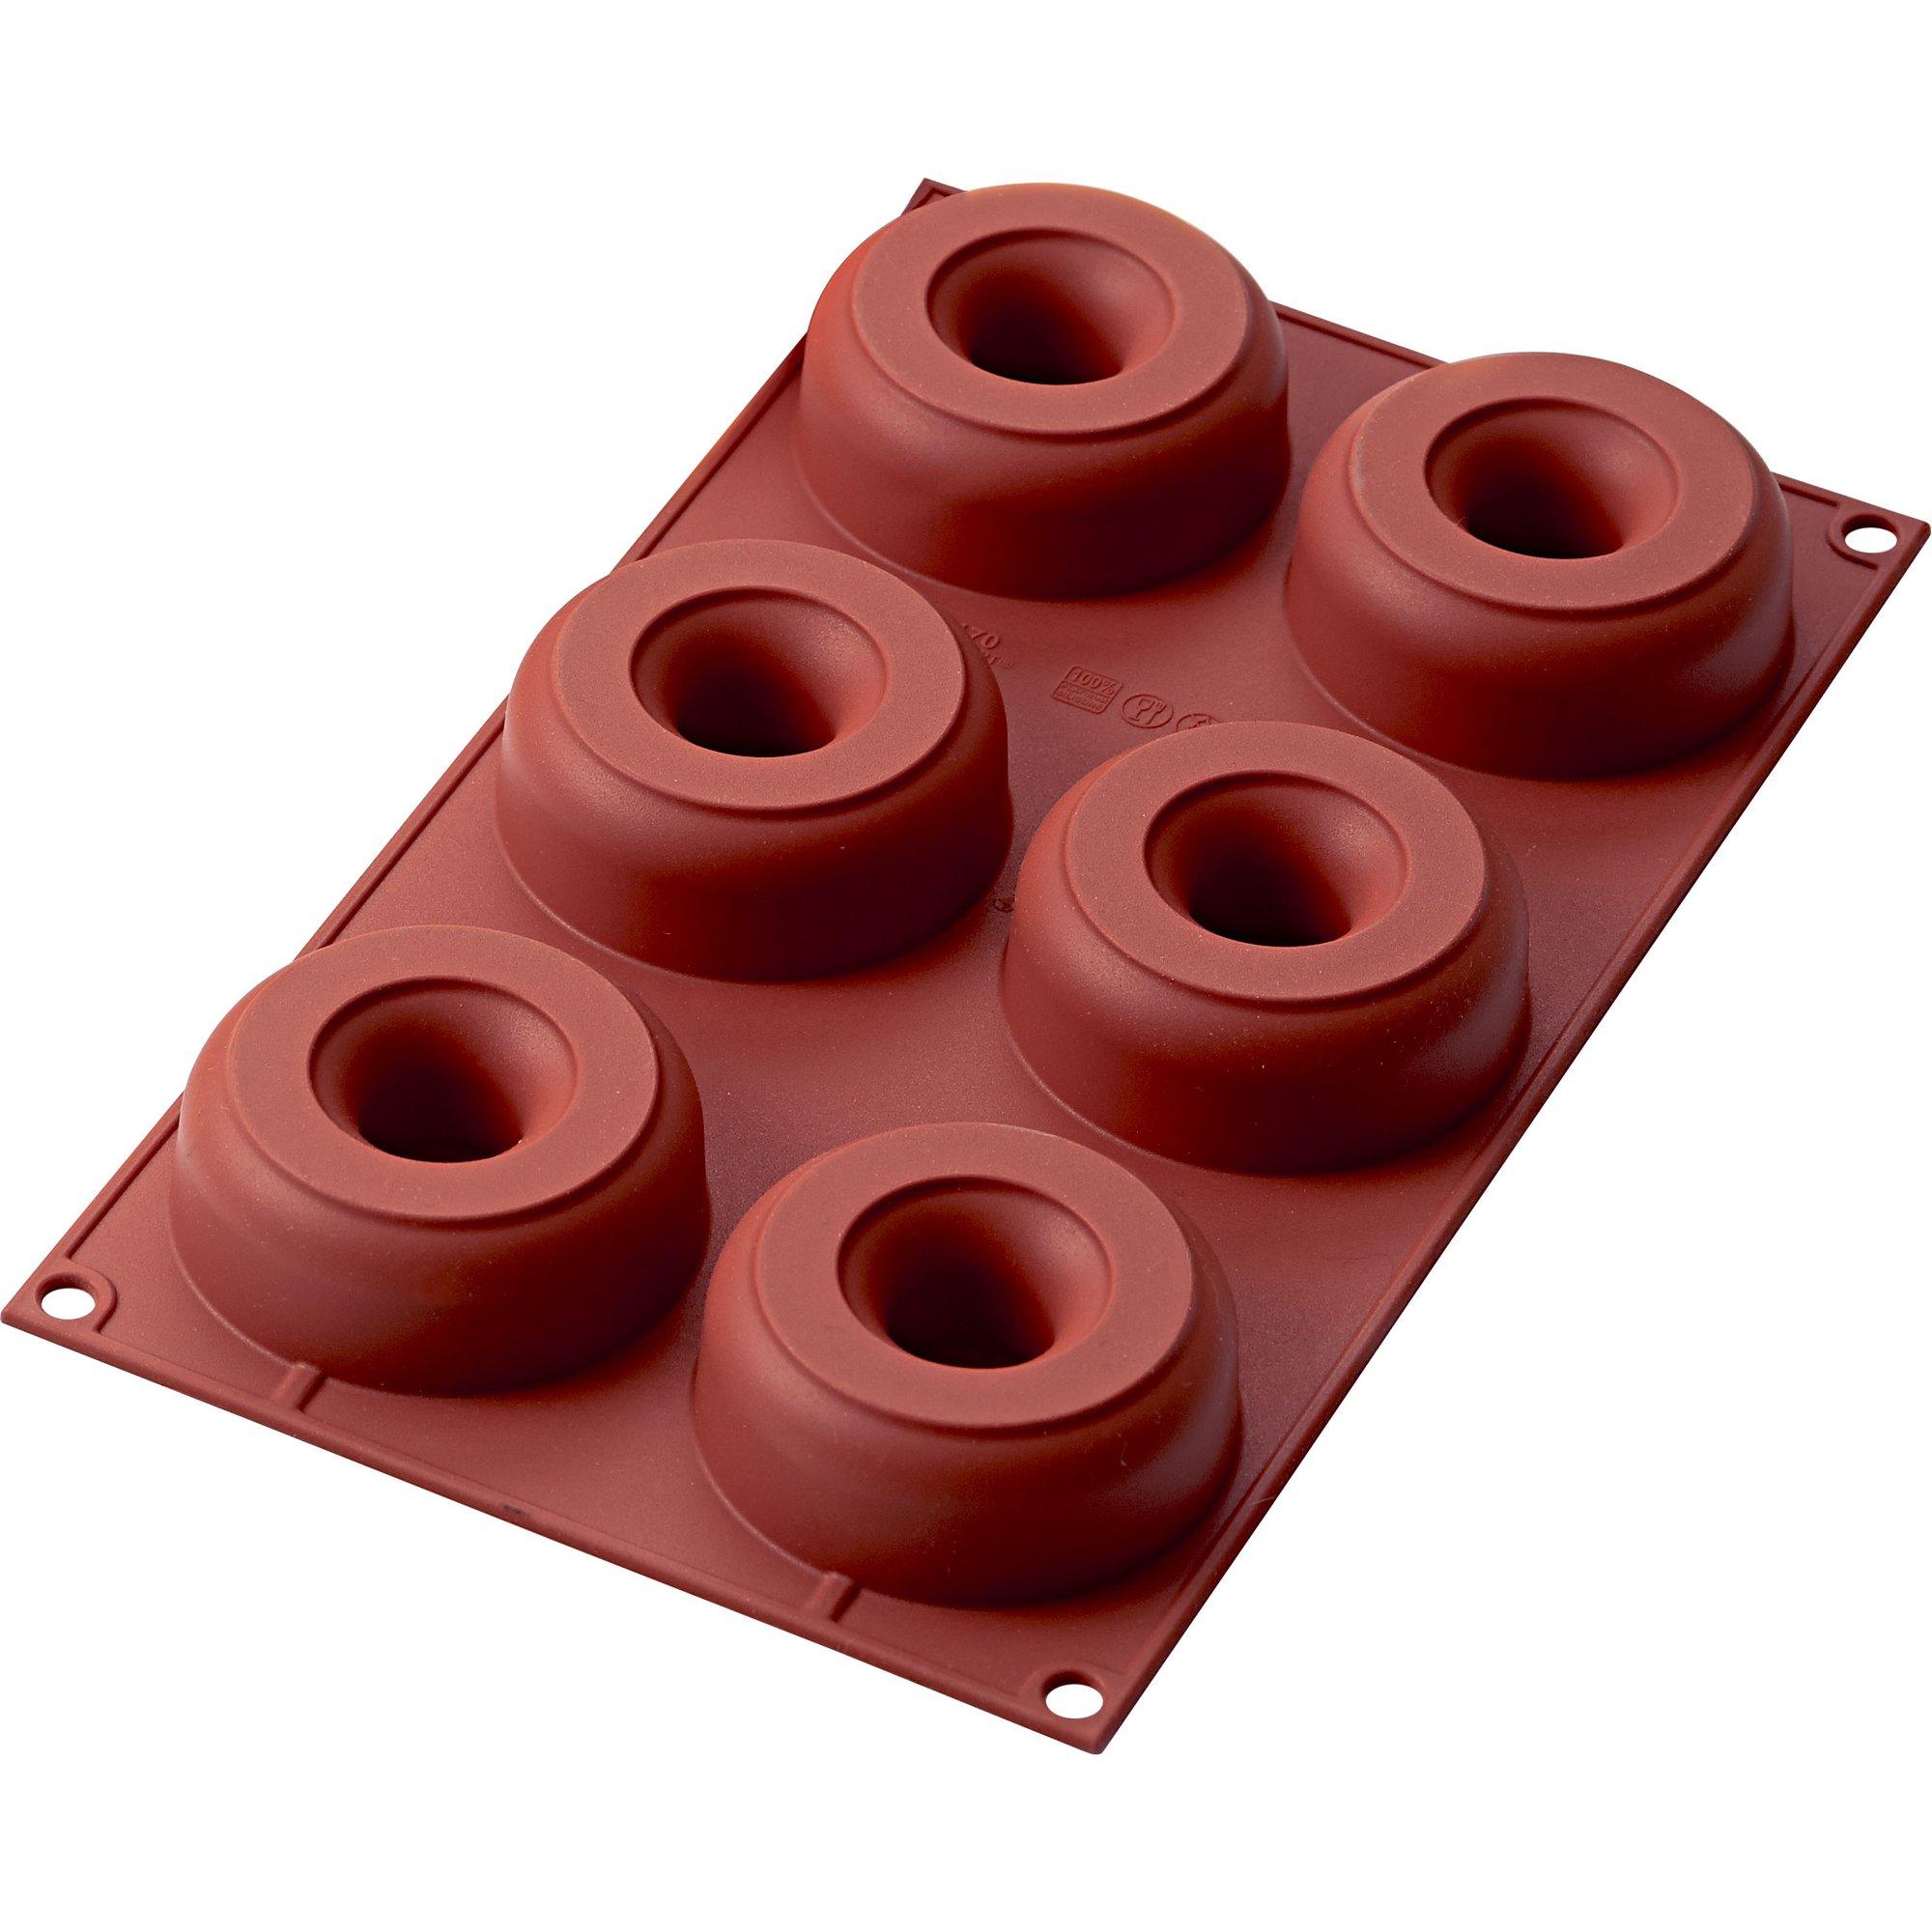 Silikomart Donuts bakform